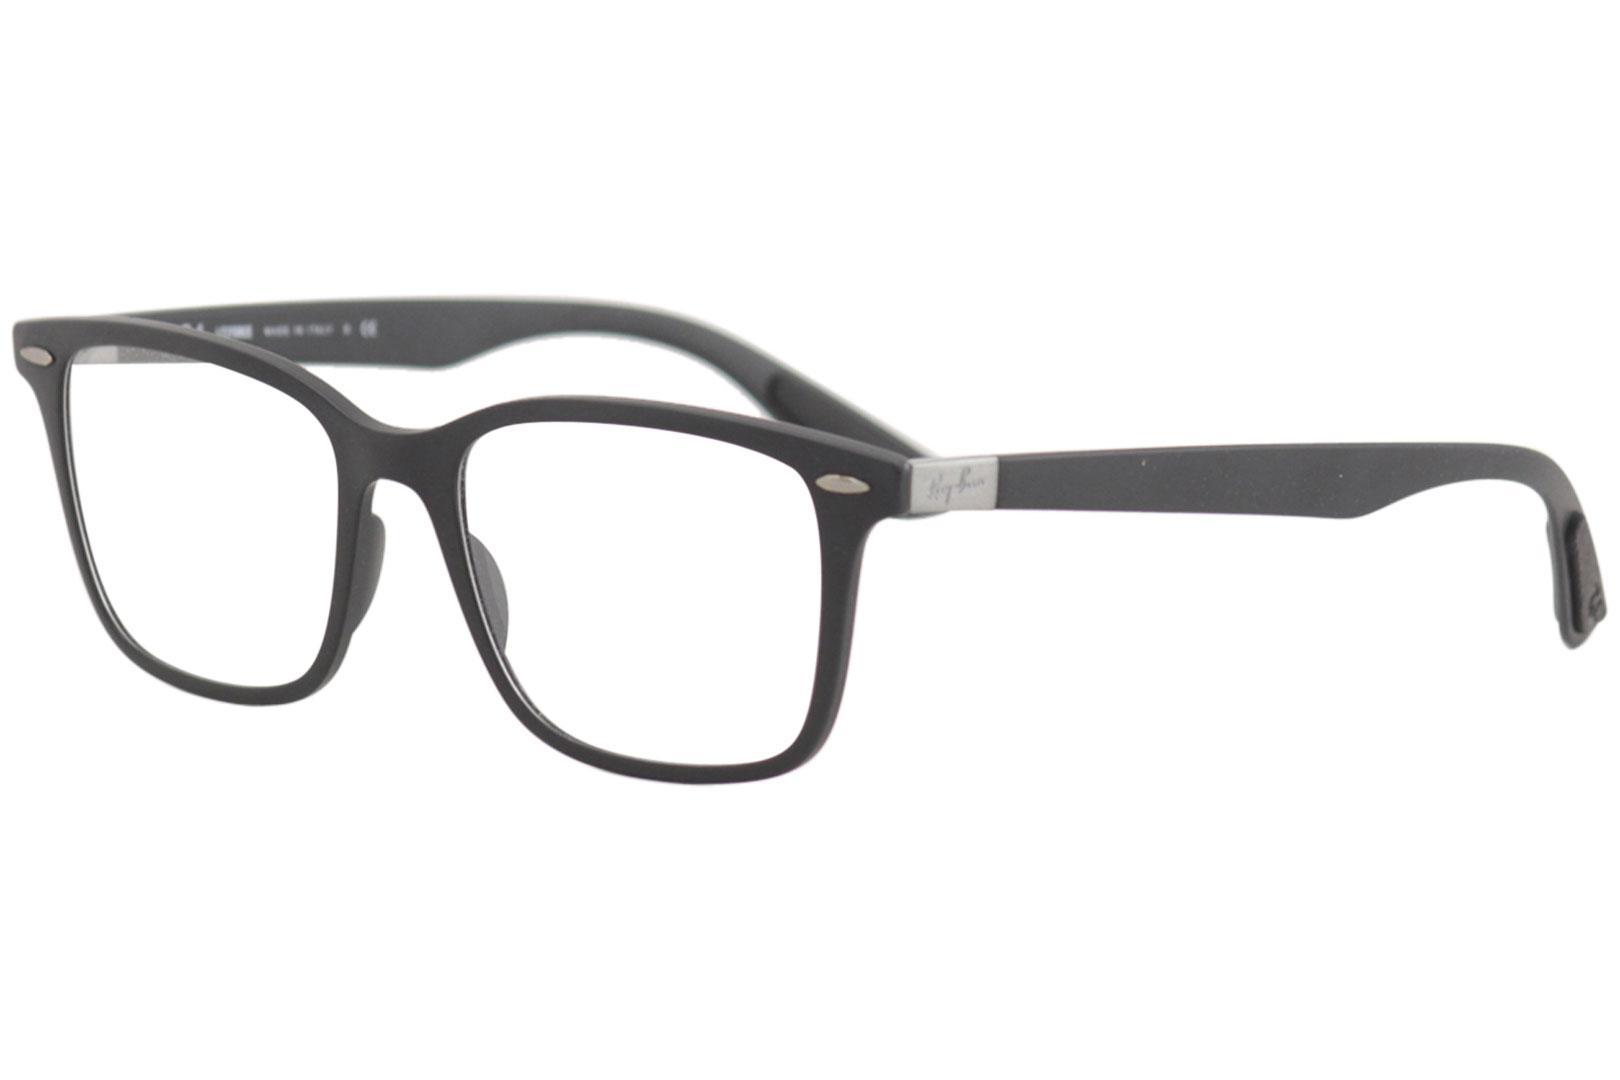 f897fe6e6c6f Ray Ban Men's Eyeglasses RX7144 RX/7144 Full Rim Optical Frame